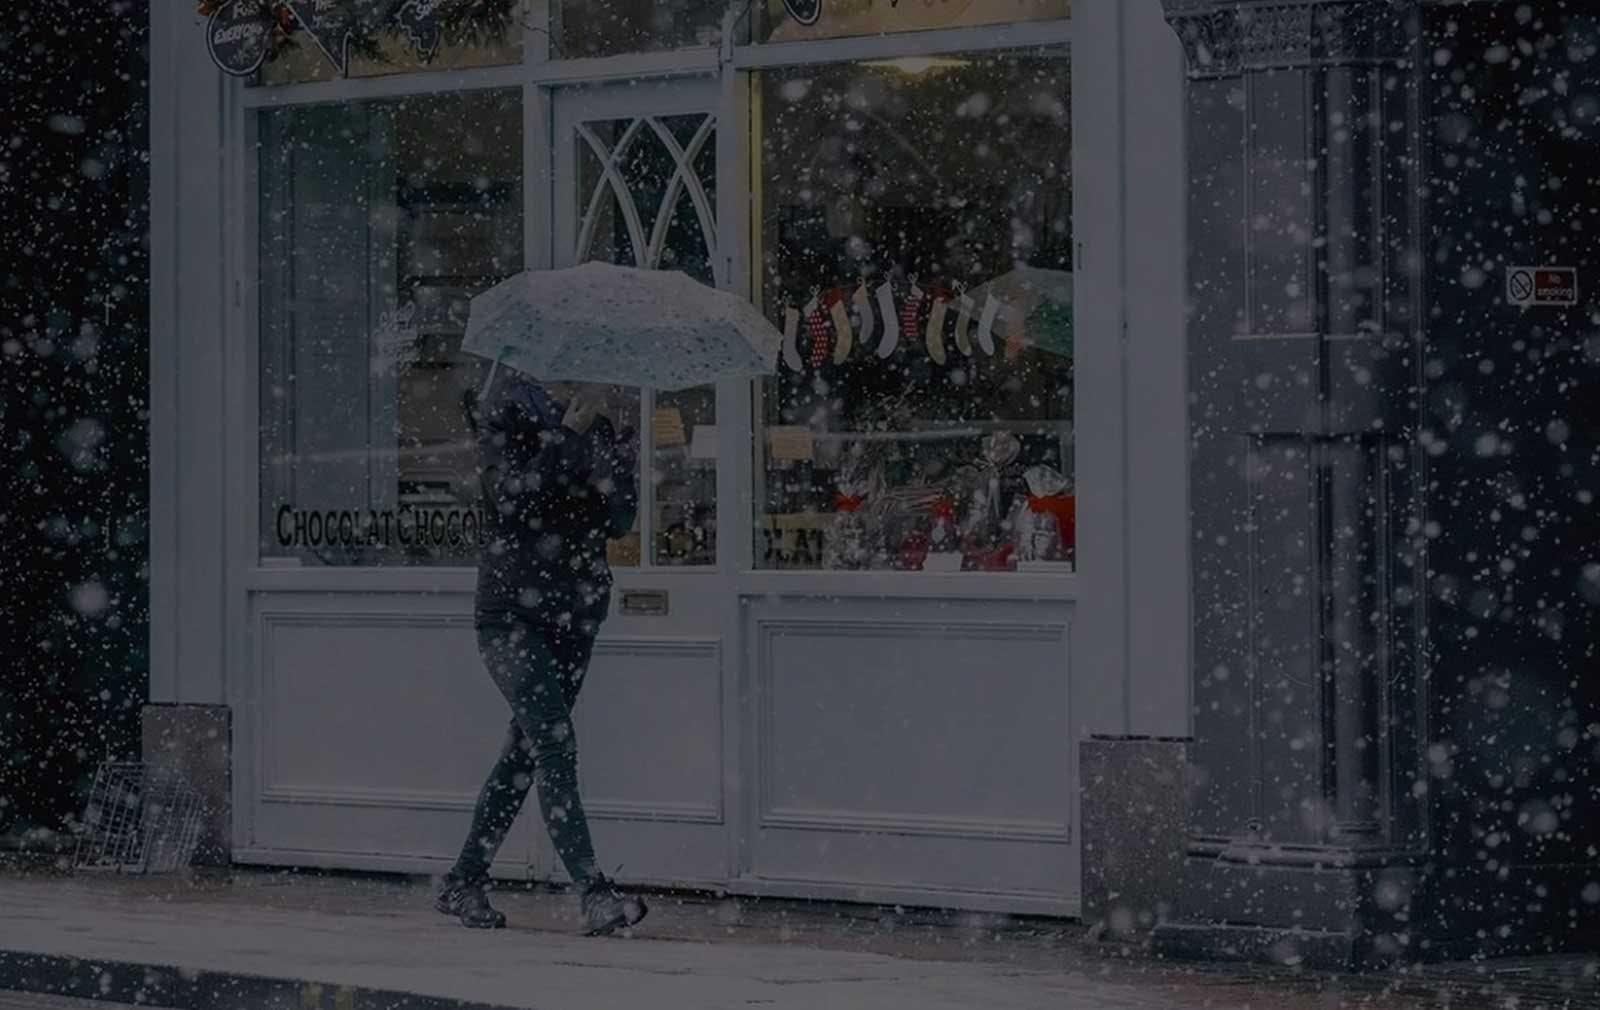 OX HolidayReport HeroImage Overlay2 - 2019 Christmas Shopping Report - UK